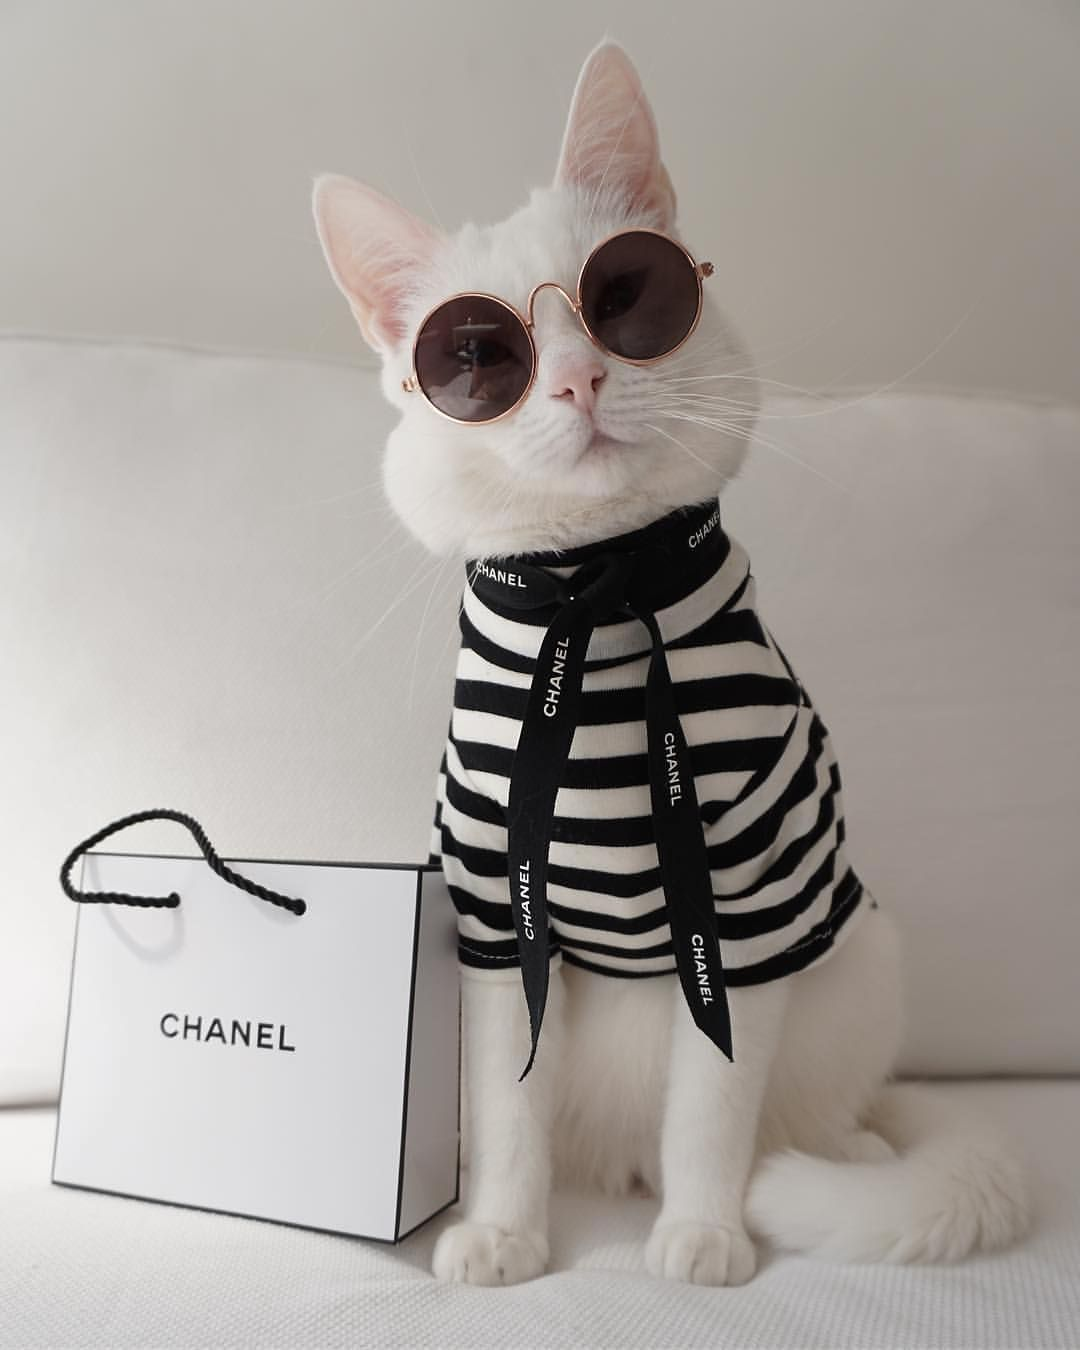 I Don T Do Fashion I Am Fashion Zappa The Cat Coco Chanel Catsofinsta Cuteness Sunnies Animallover Cats Cute Baby Animals Cute Cats Cute Animals